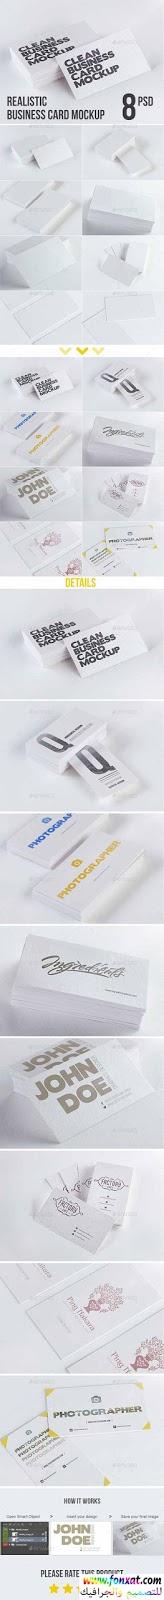 business card mock up موك اب للكروت الشخصية وبطاقات الاعمال